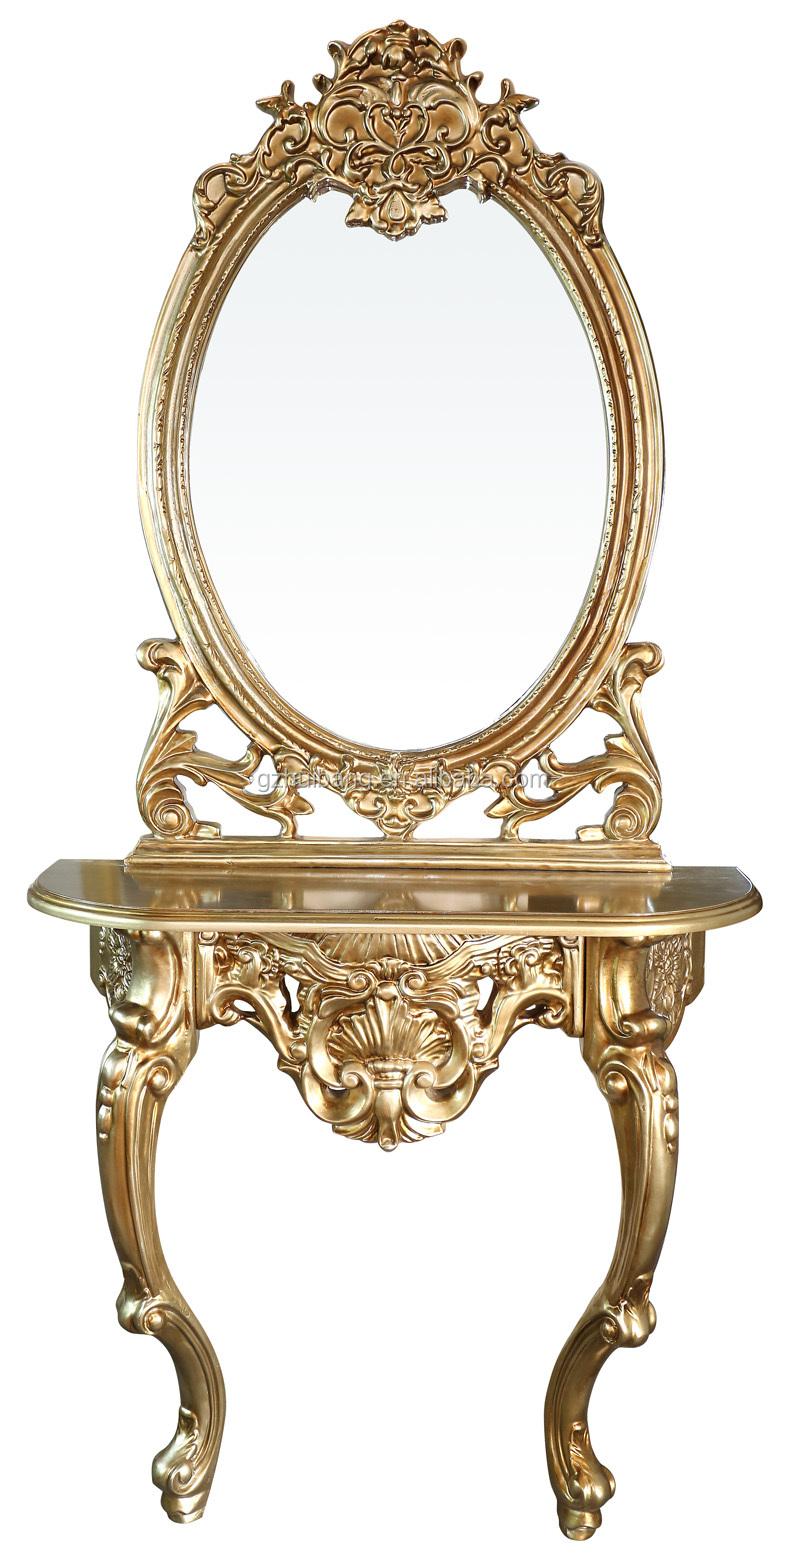 White hairdressing hair salon mirror table mirror for Salon table and mirror